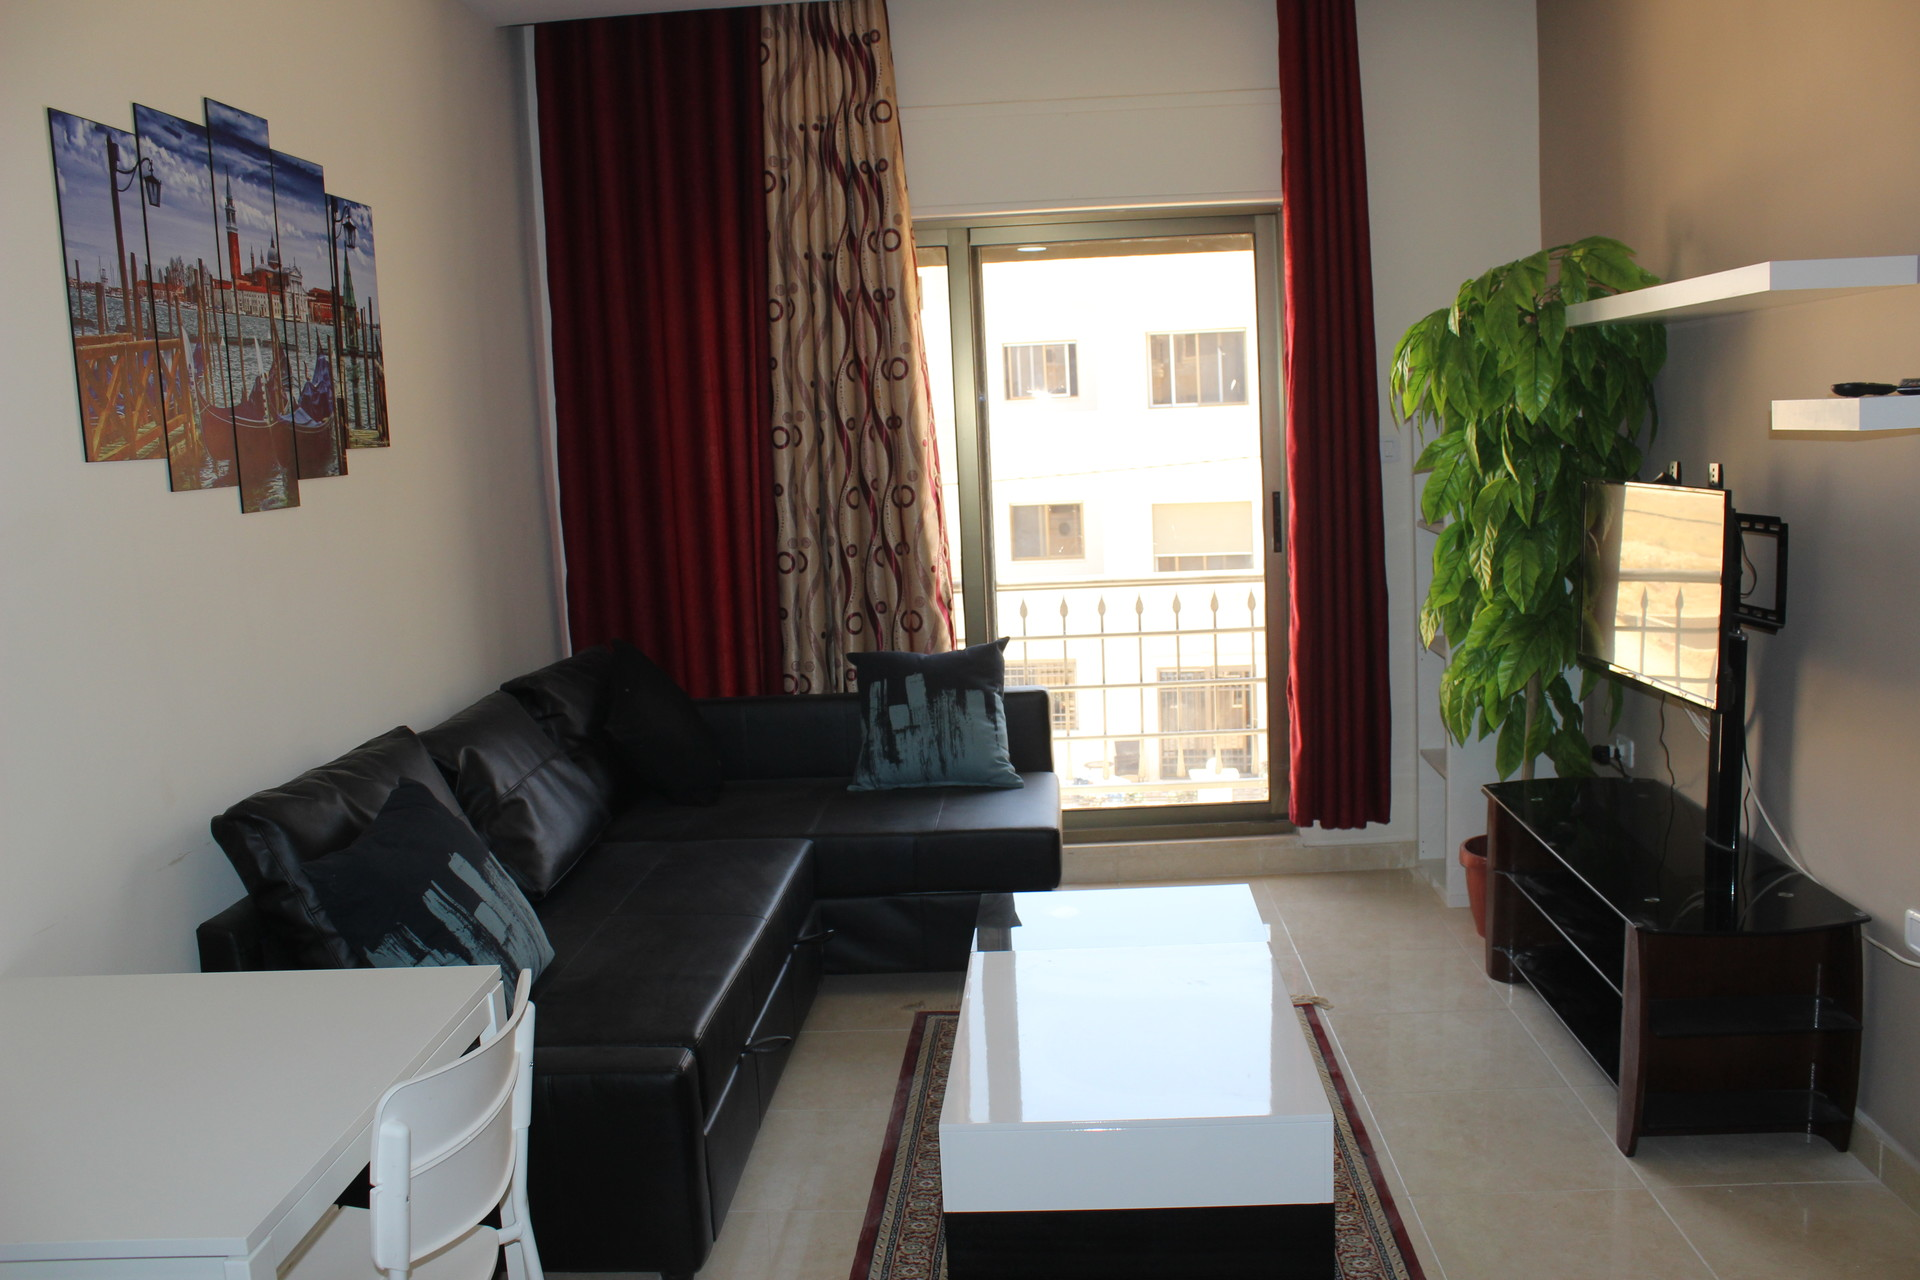 New Furnished 1-Bedroom Apartment Near to Jordan University | Flat ...